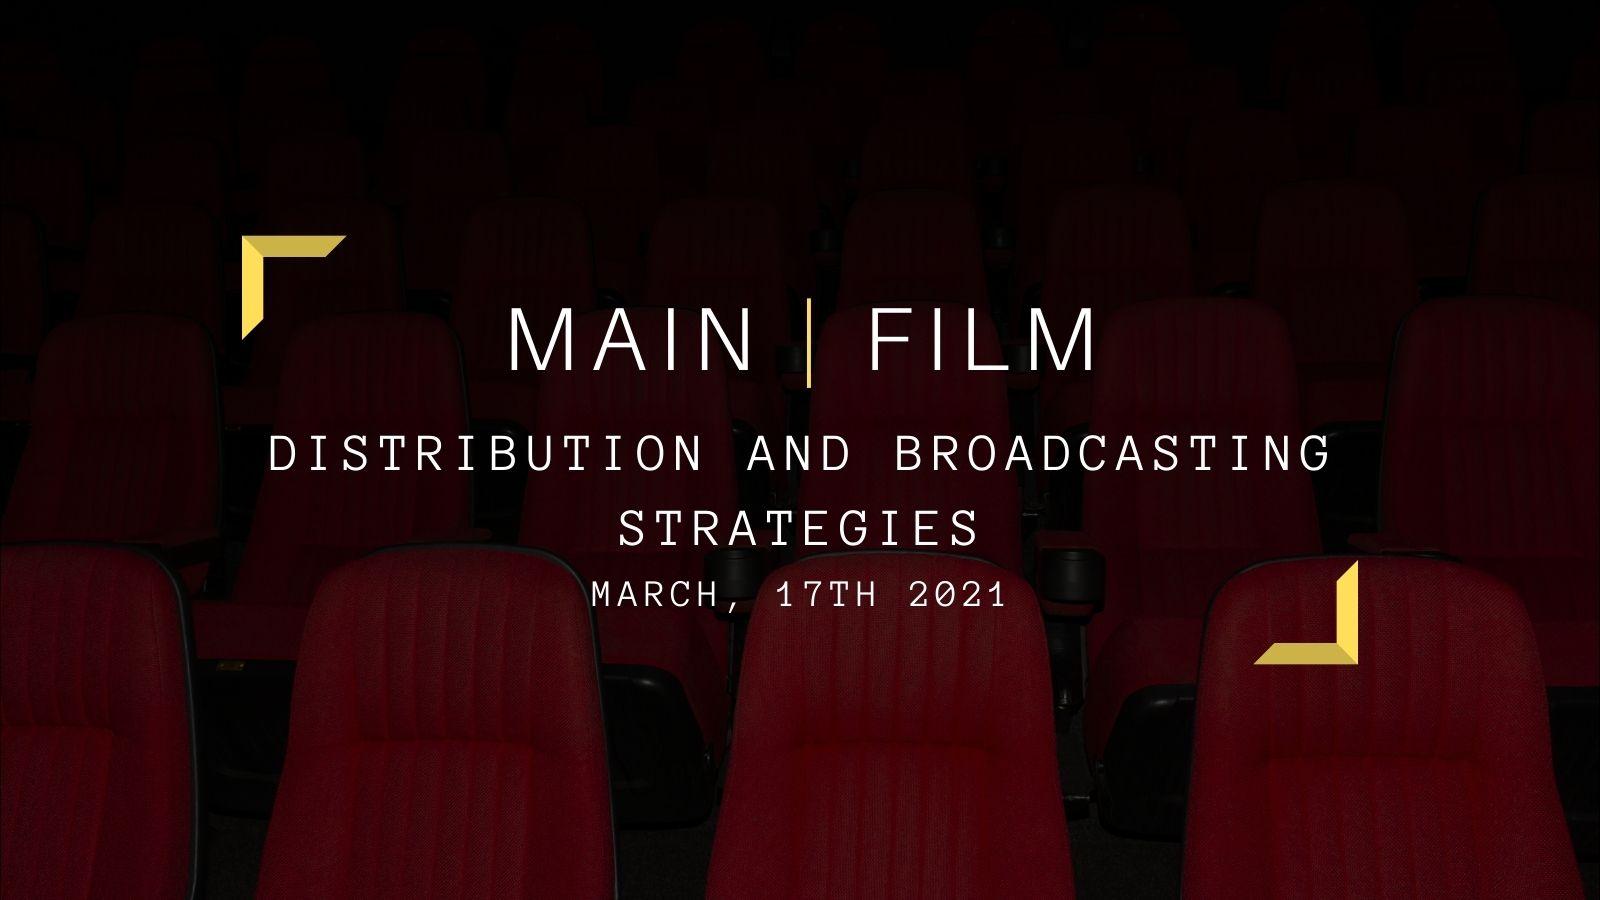 Broadcasting strategies | Online